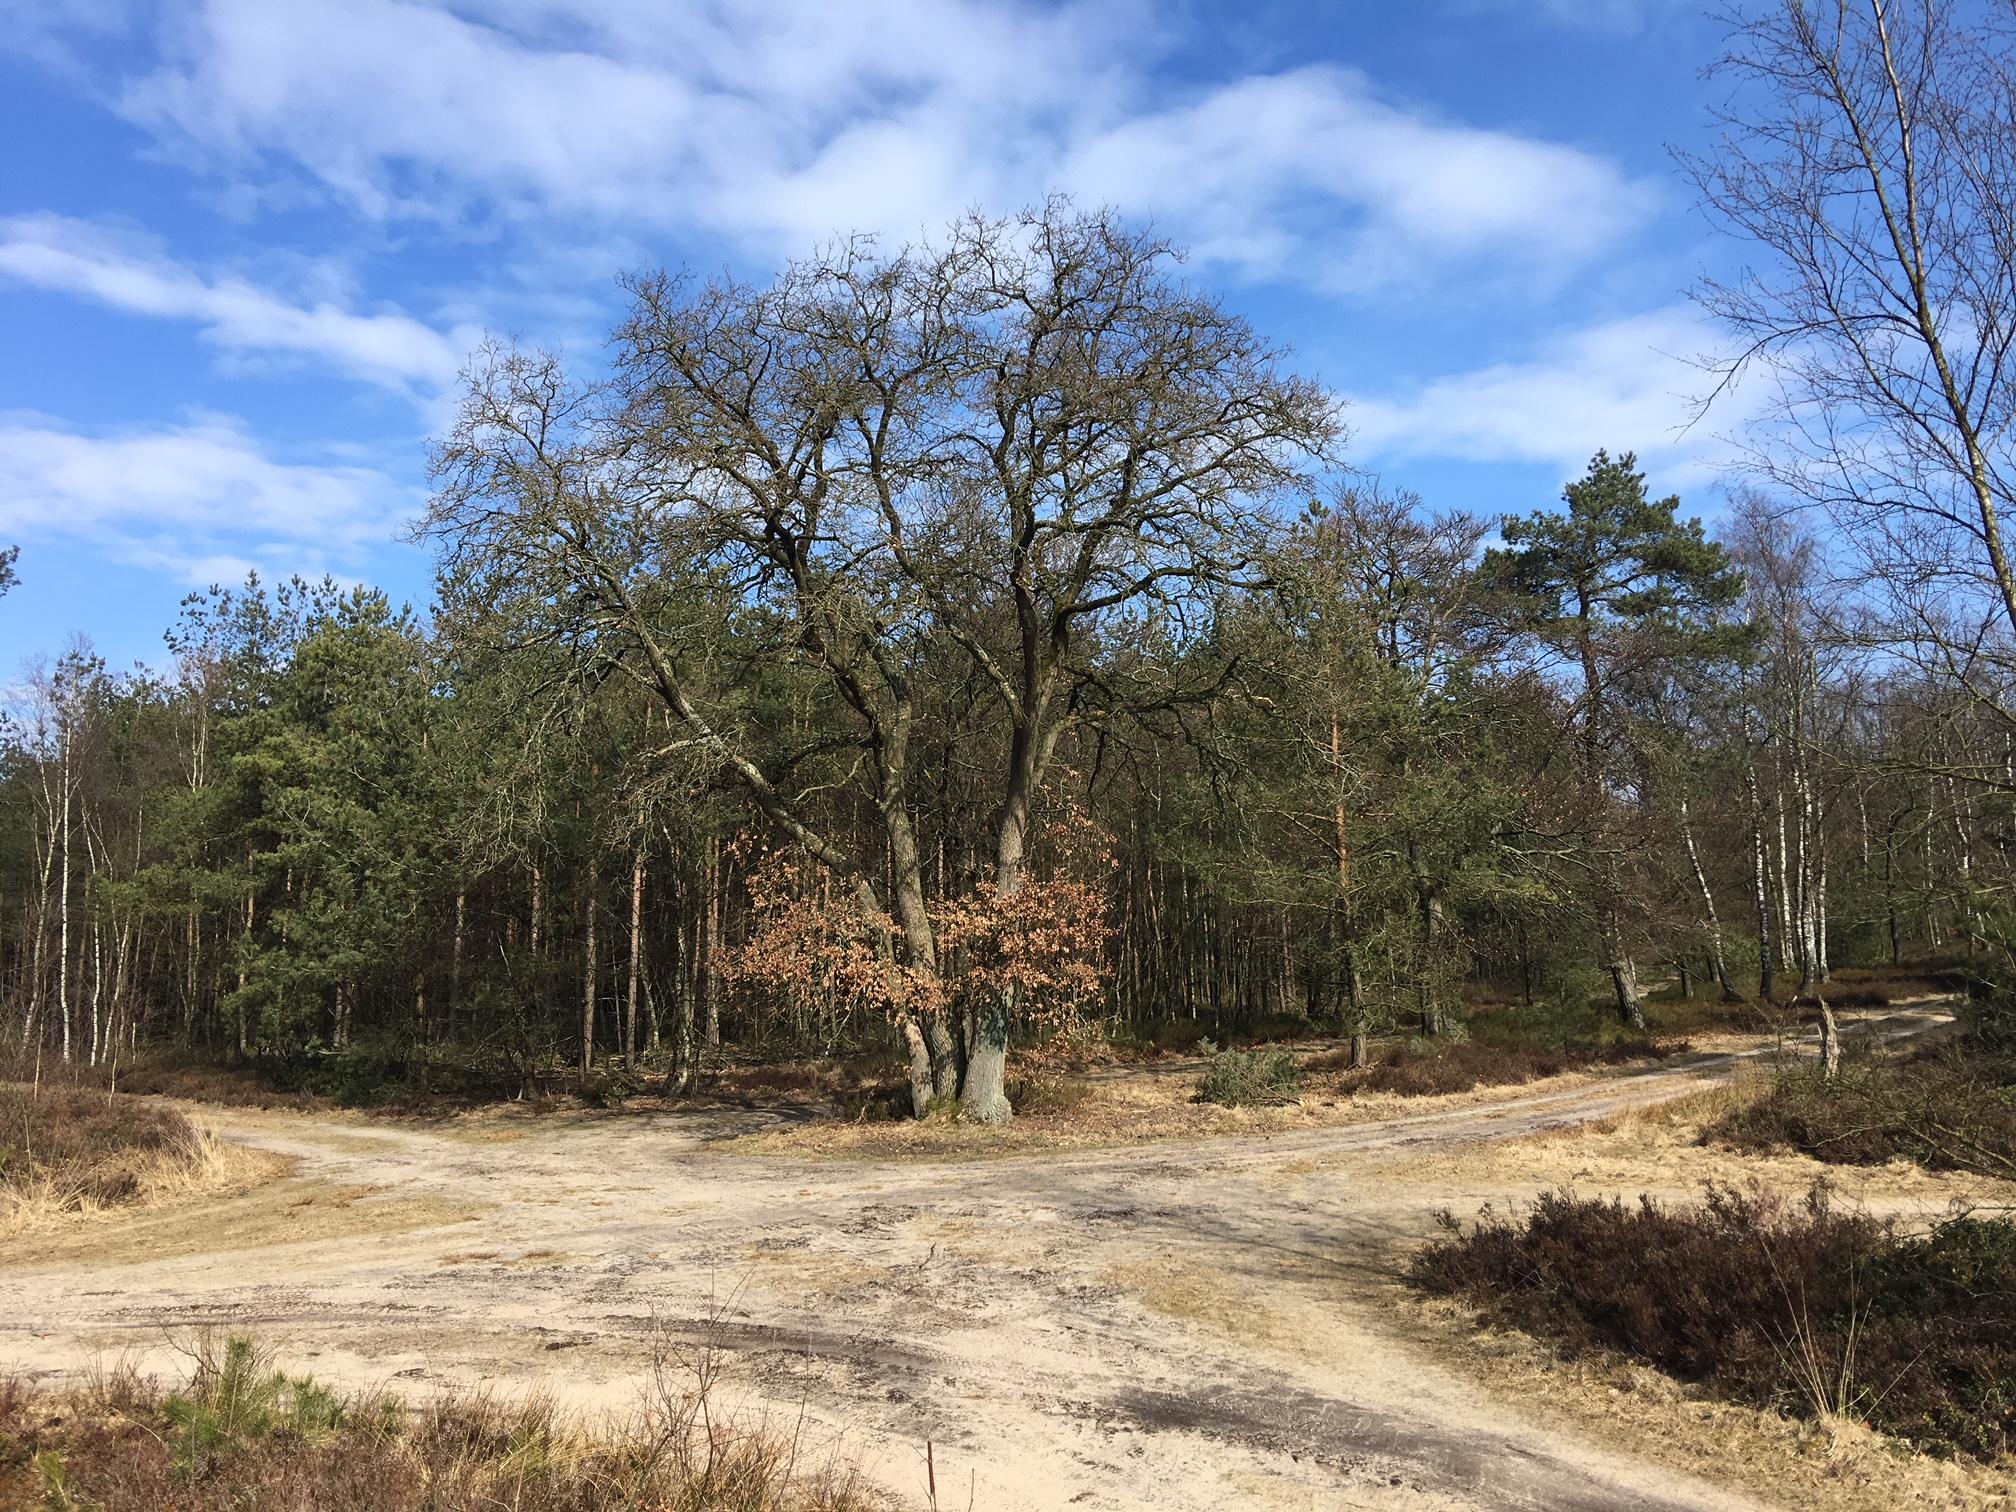 Wandelroute Veluwe 10 km